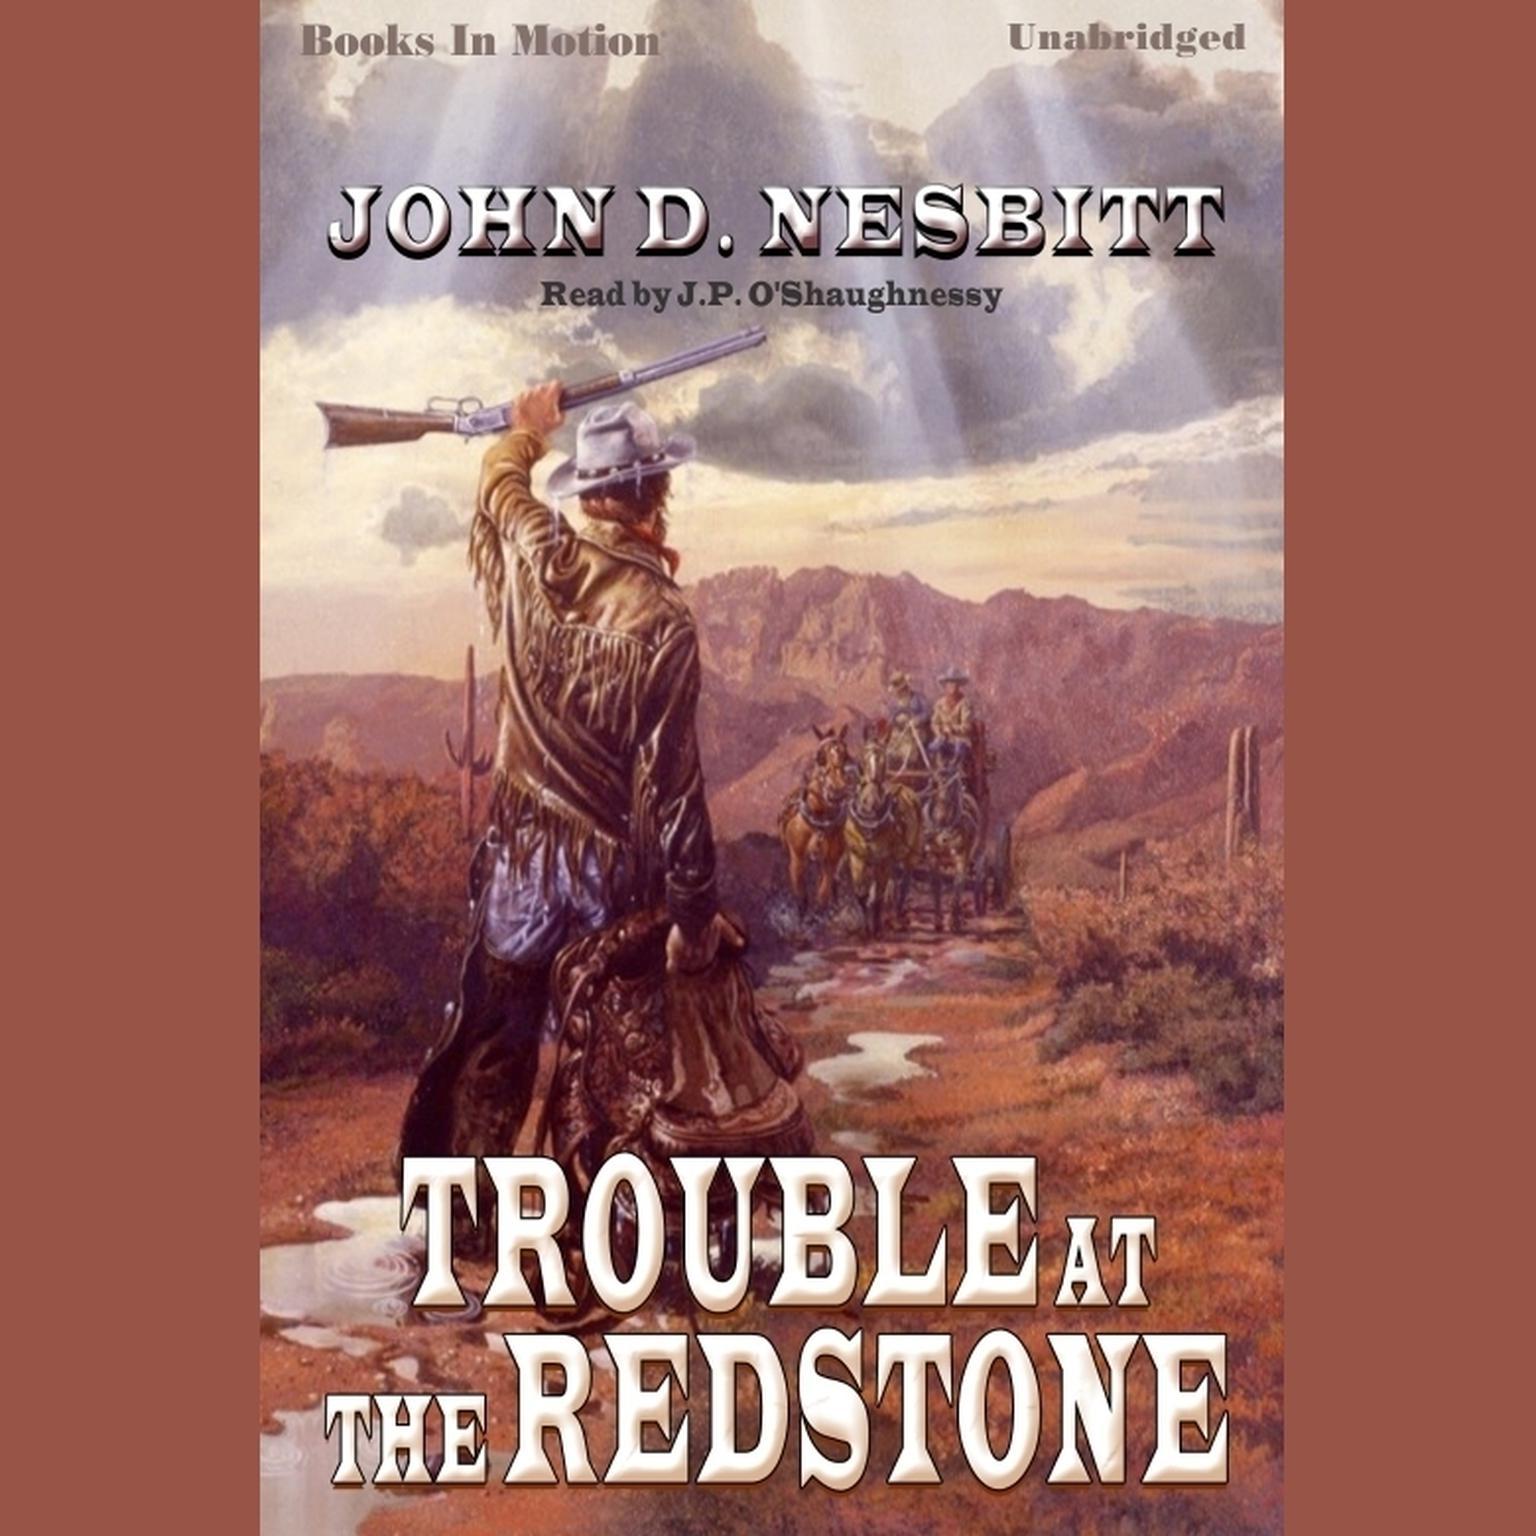 Trouble At The Redstone Audiobook, by John D. Nesbitt